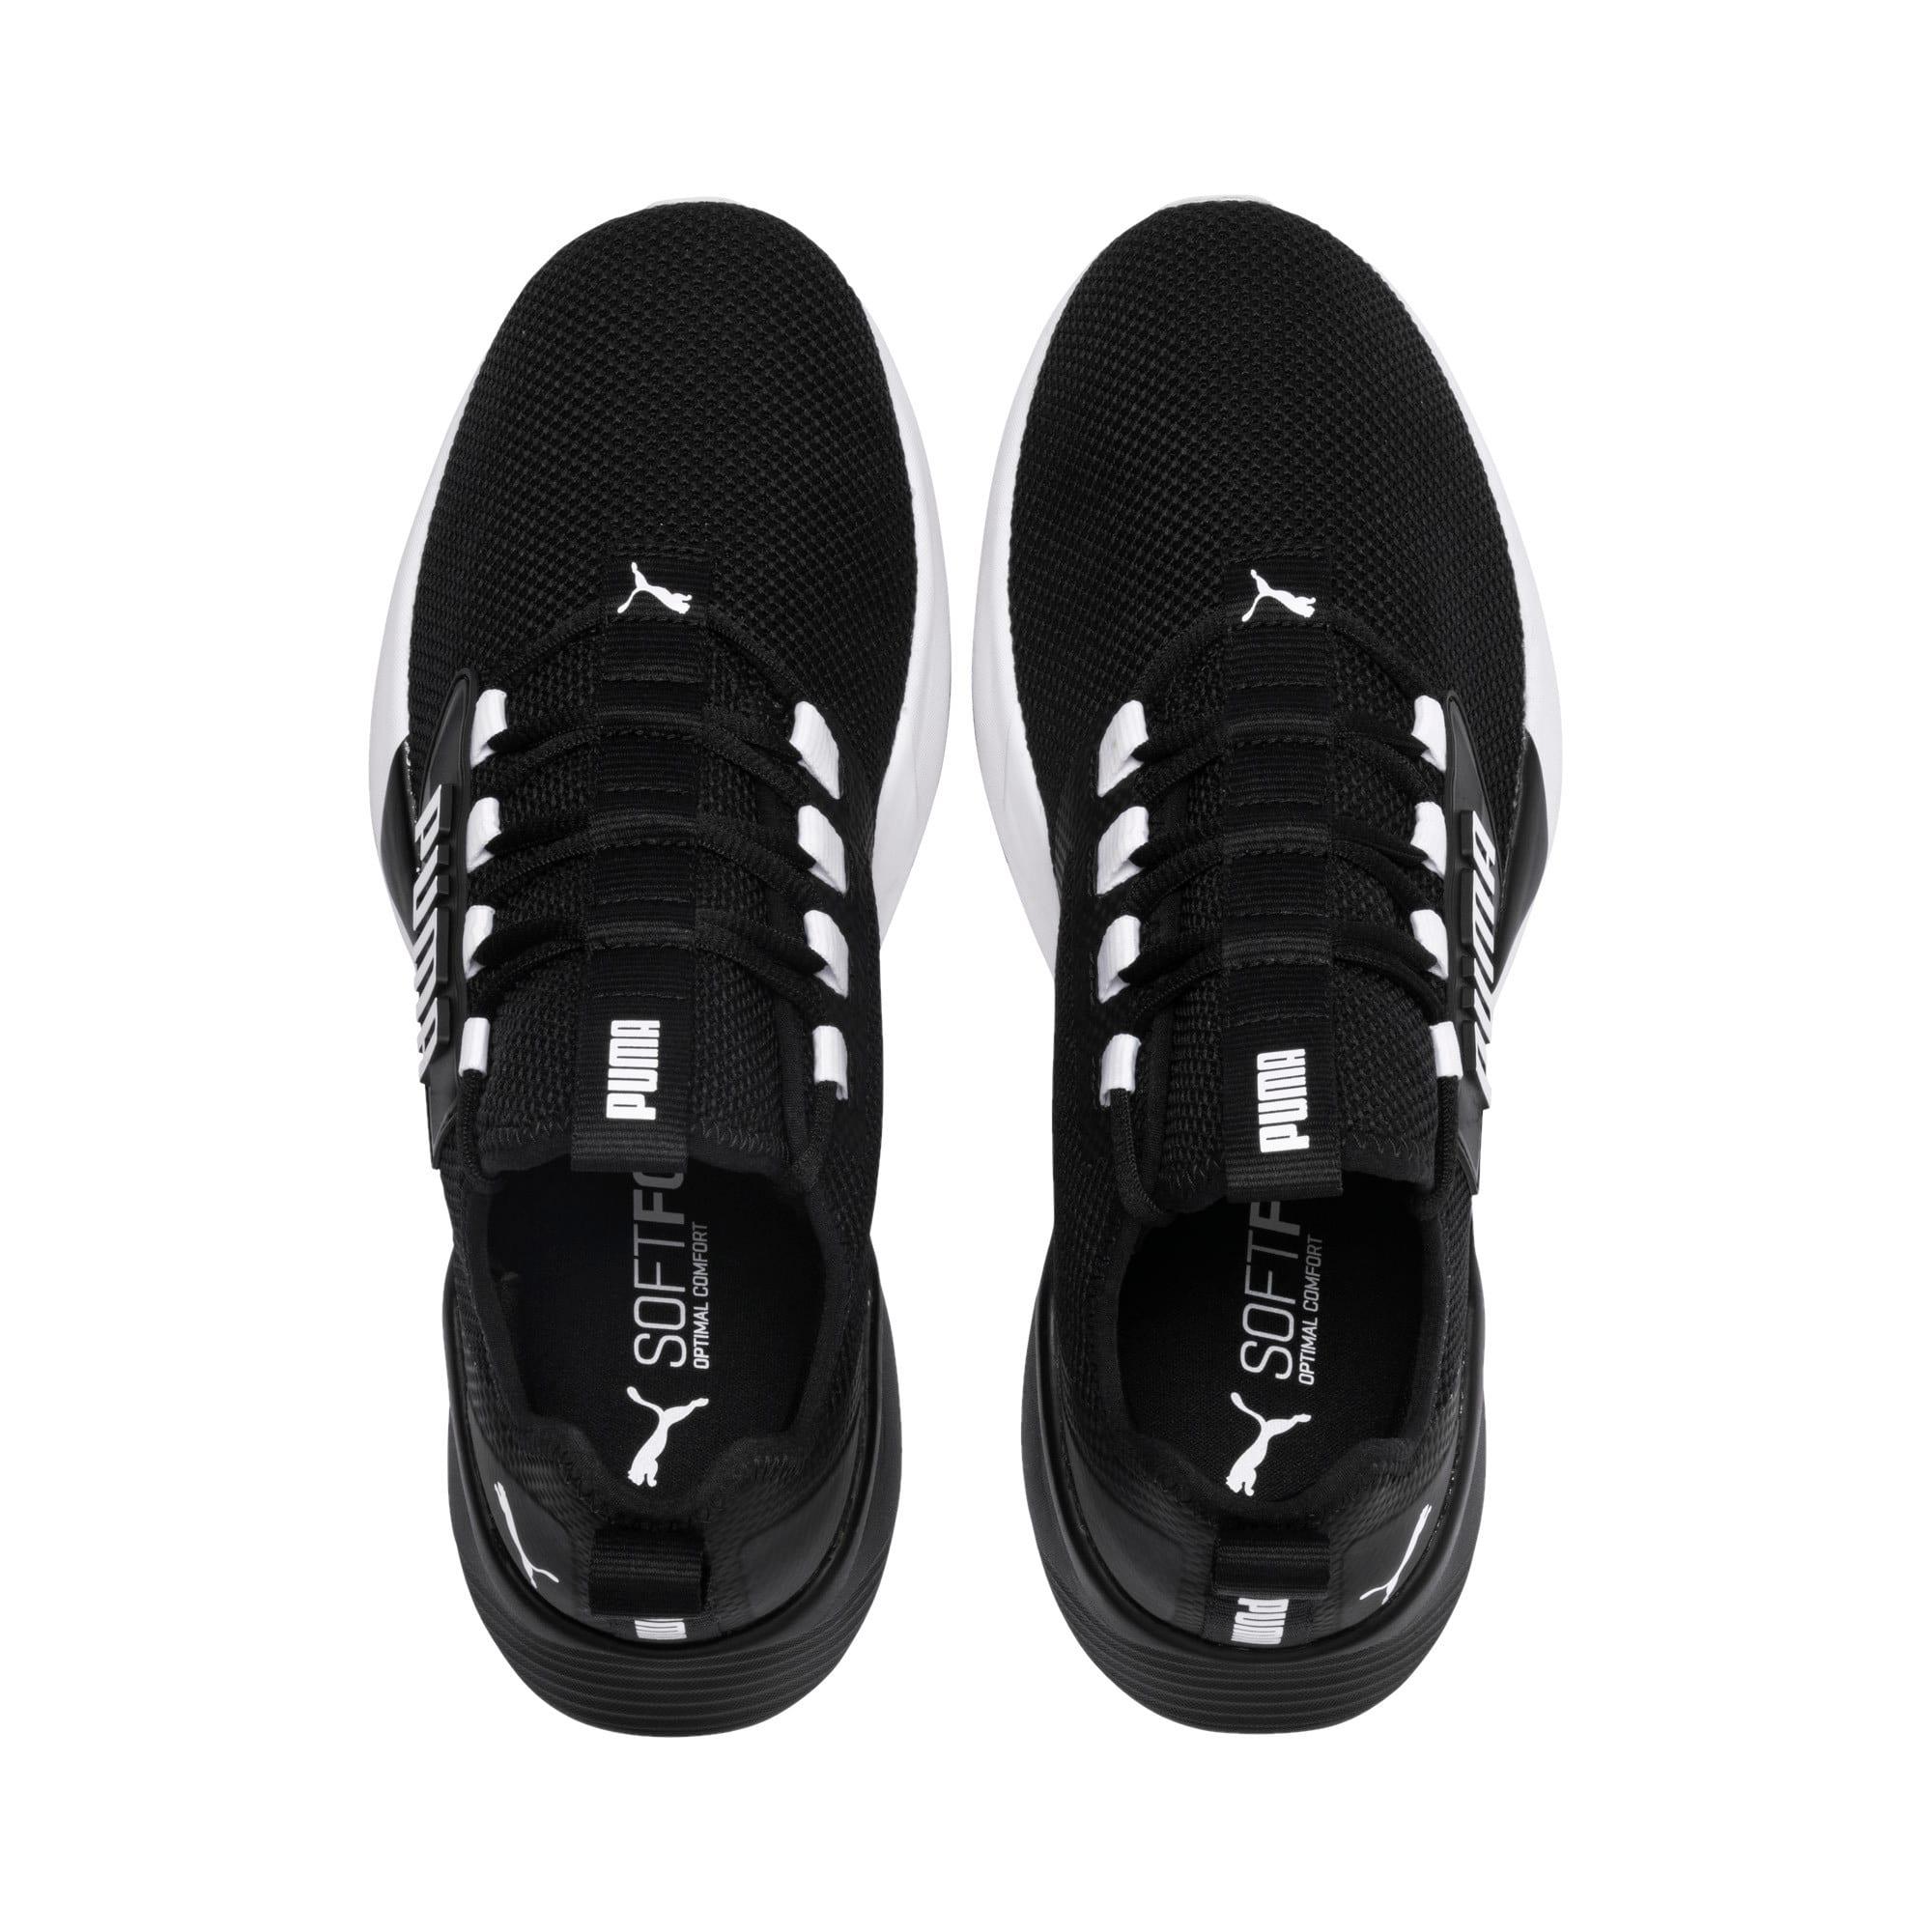 Thumbnail 6 of Retaliate Men's Training Shoes, Puma Black-Puma White, medium